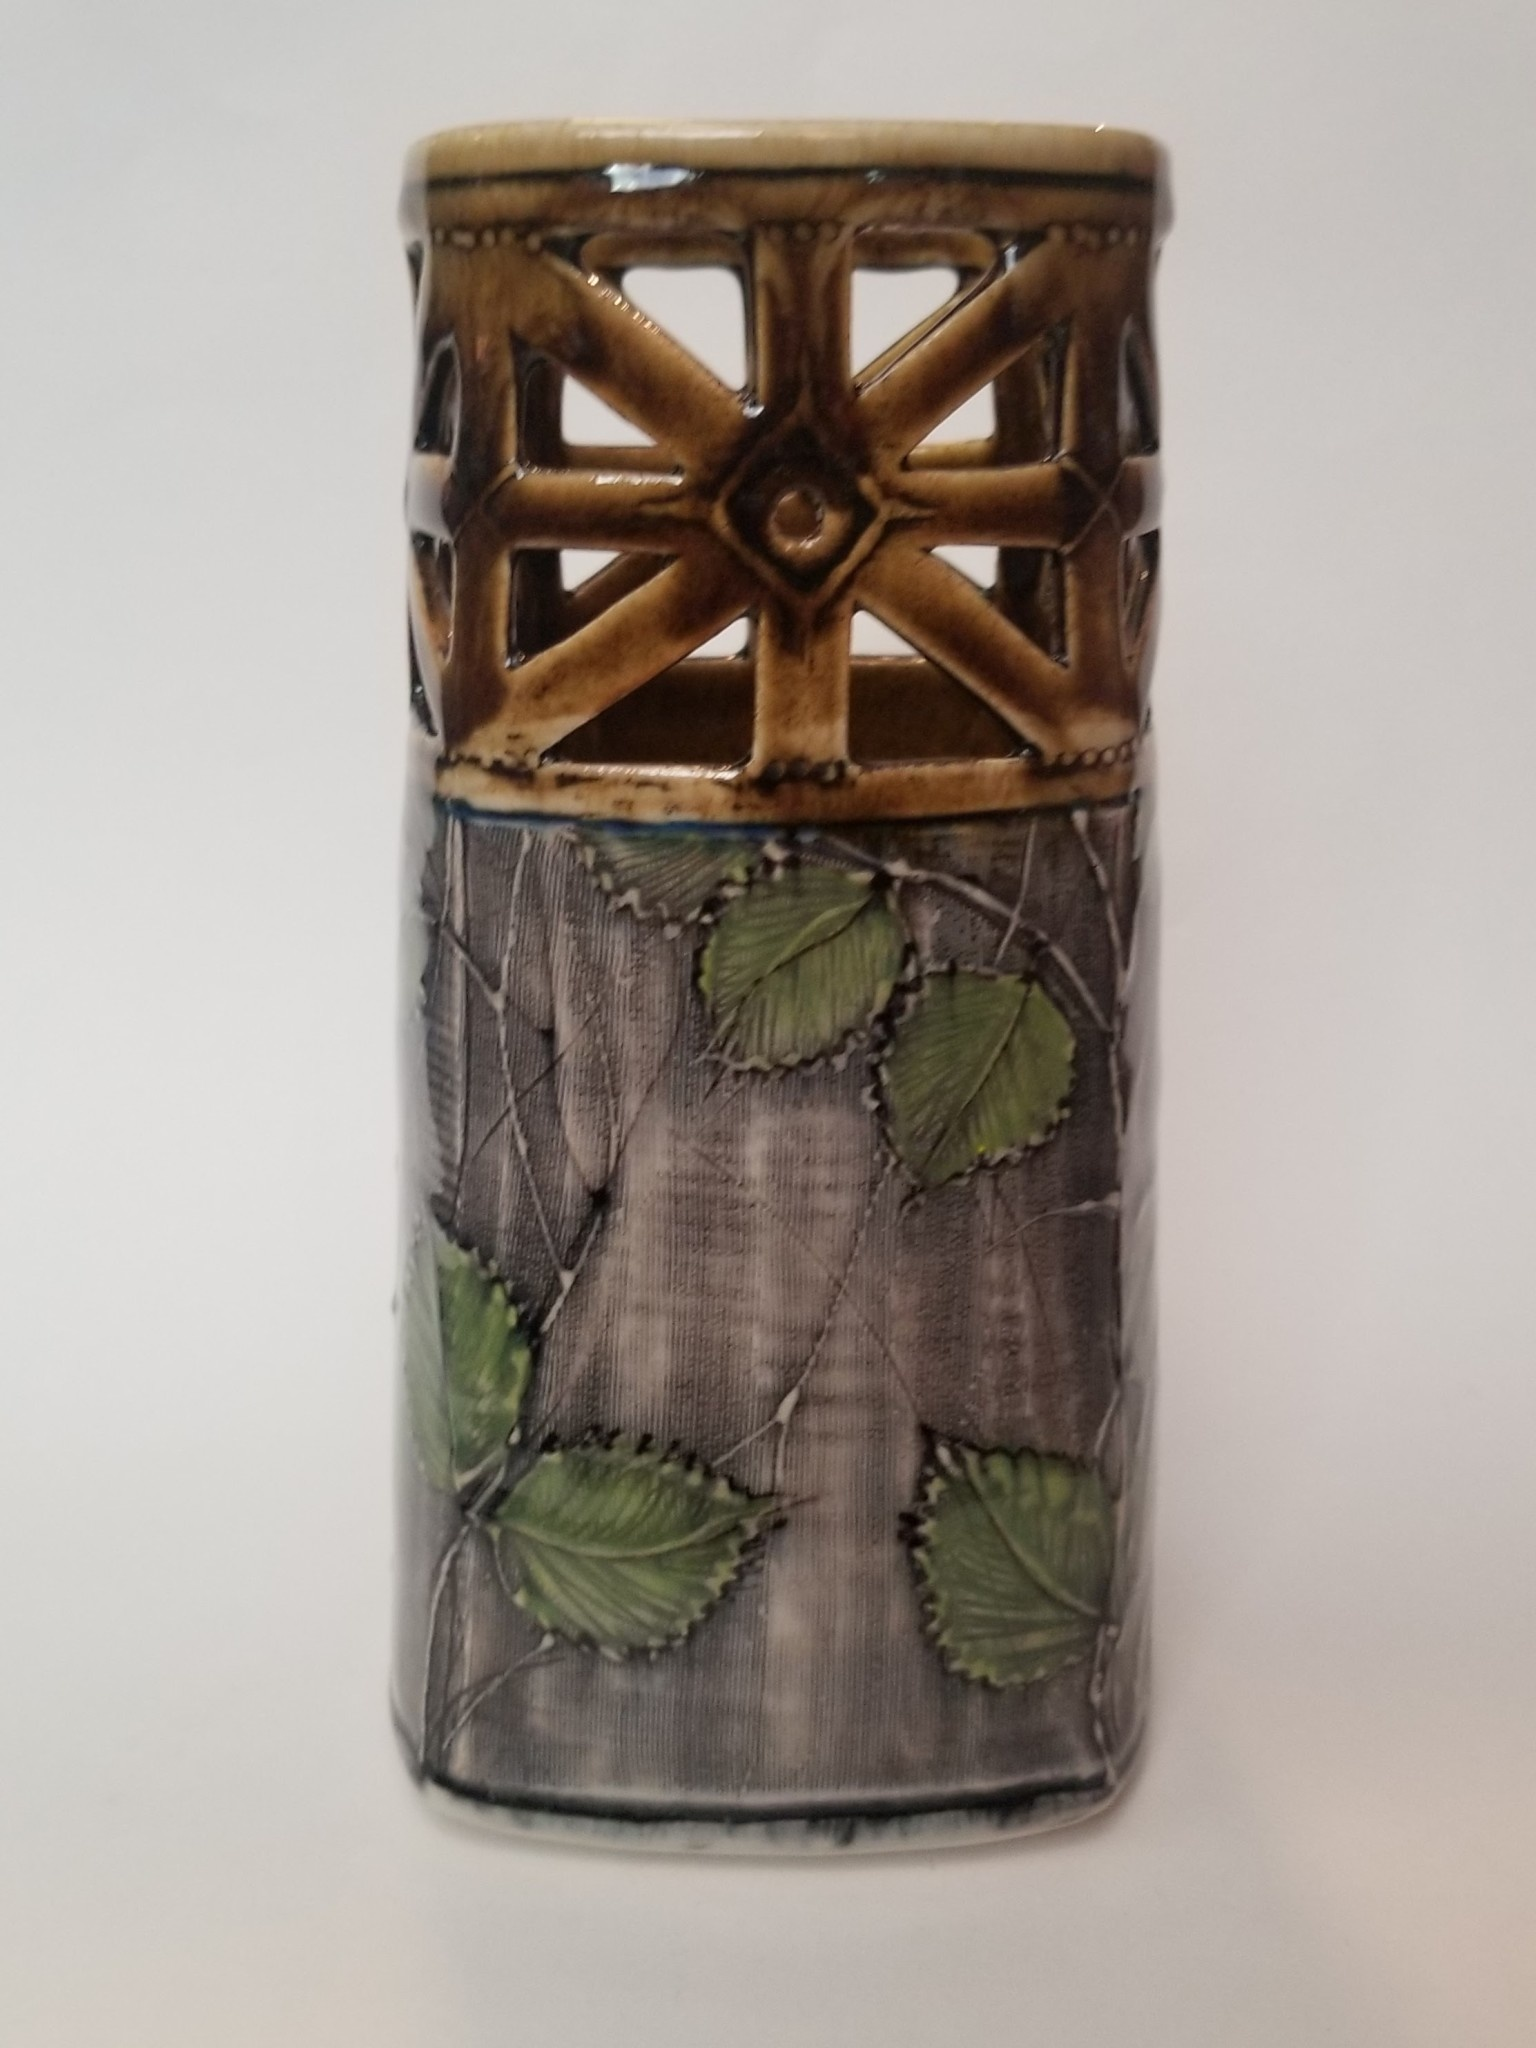 Little Sister Pottery Little Sister Pottery - Square Pierced Vase